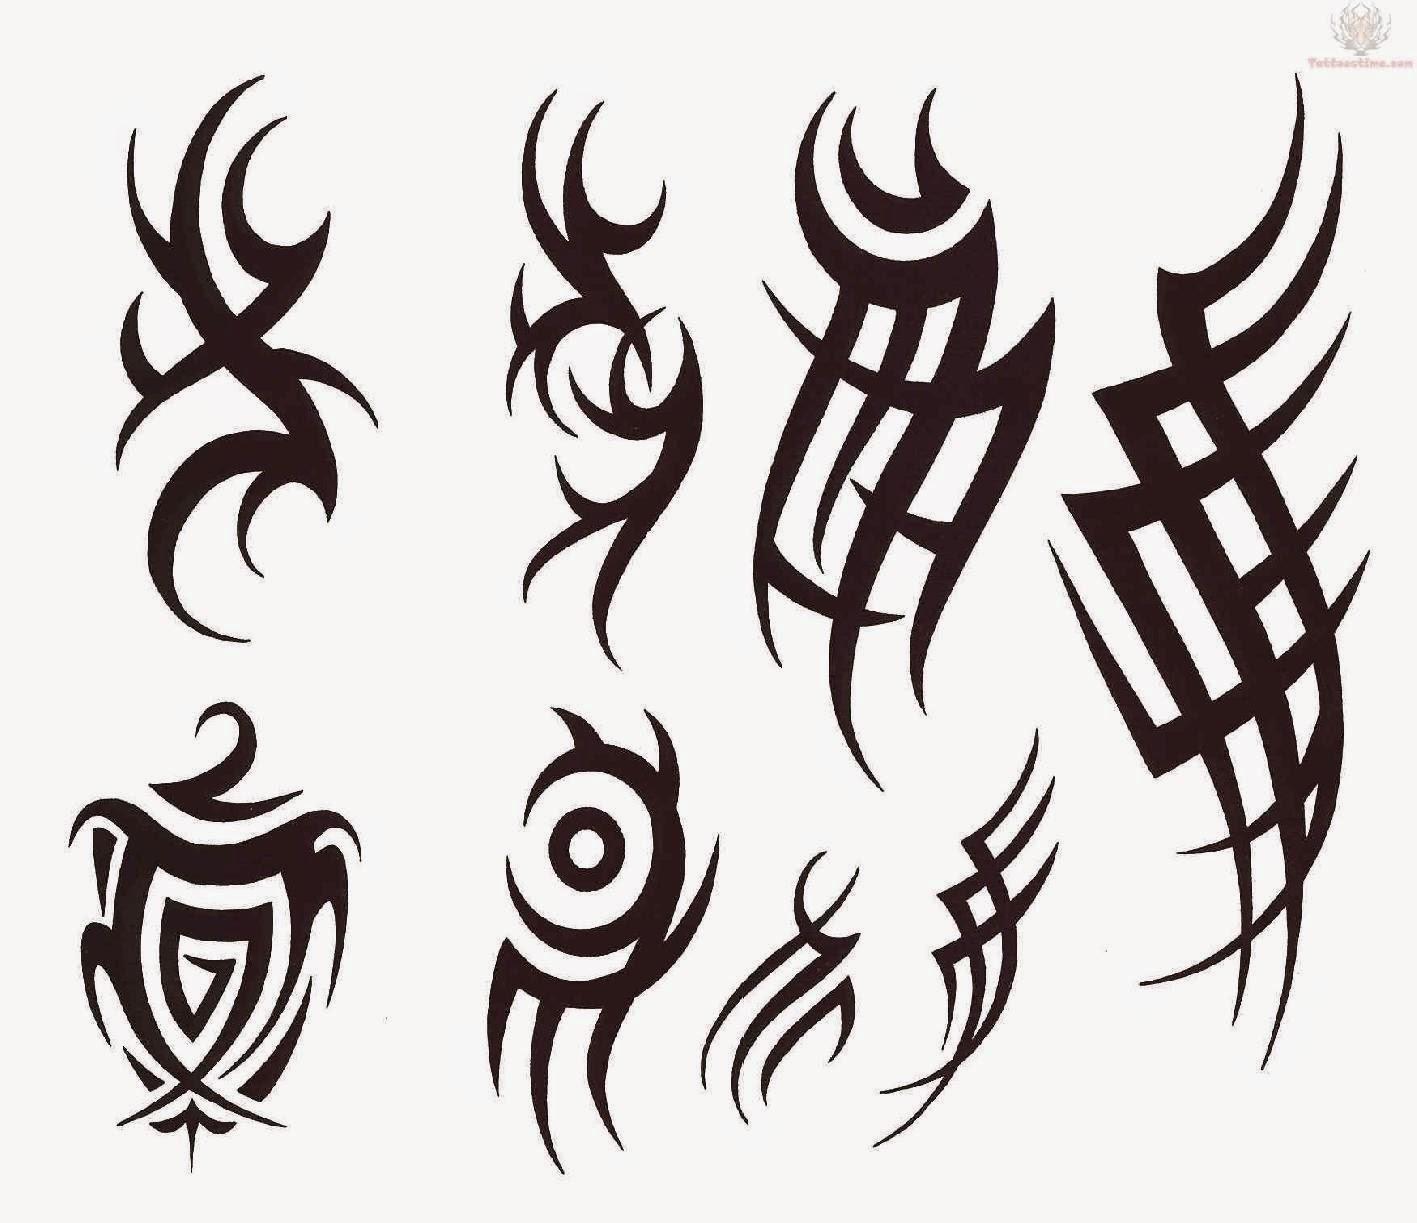 tribal tattoo designs tattoo designs. Black Bedroom Furniture Sets. Home Design Ideas